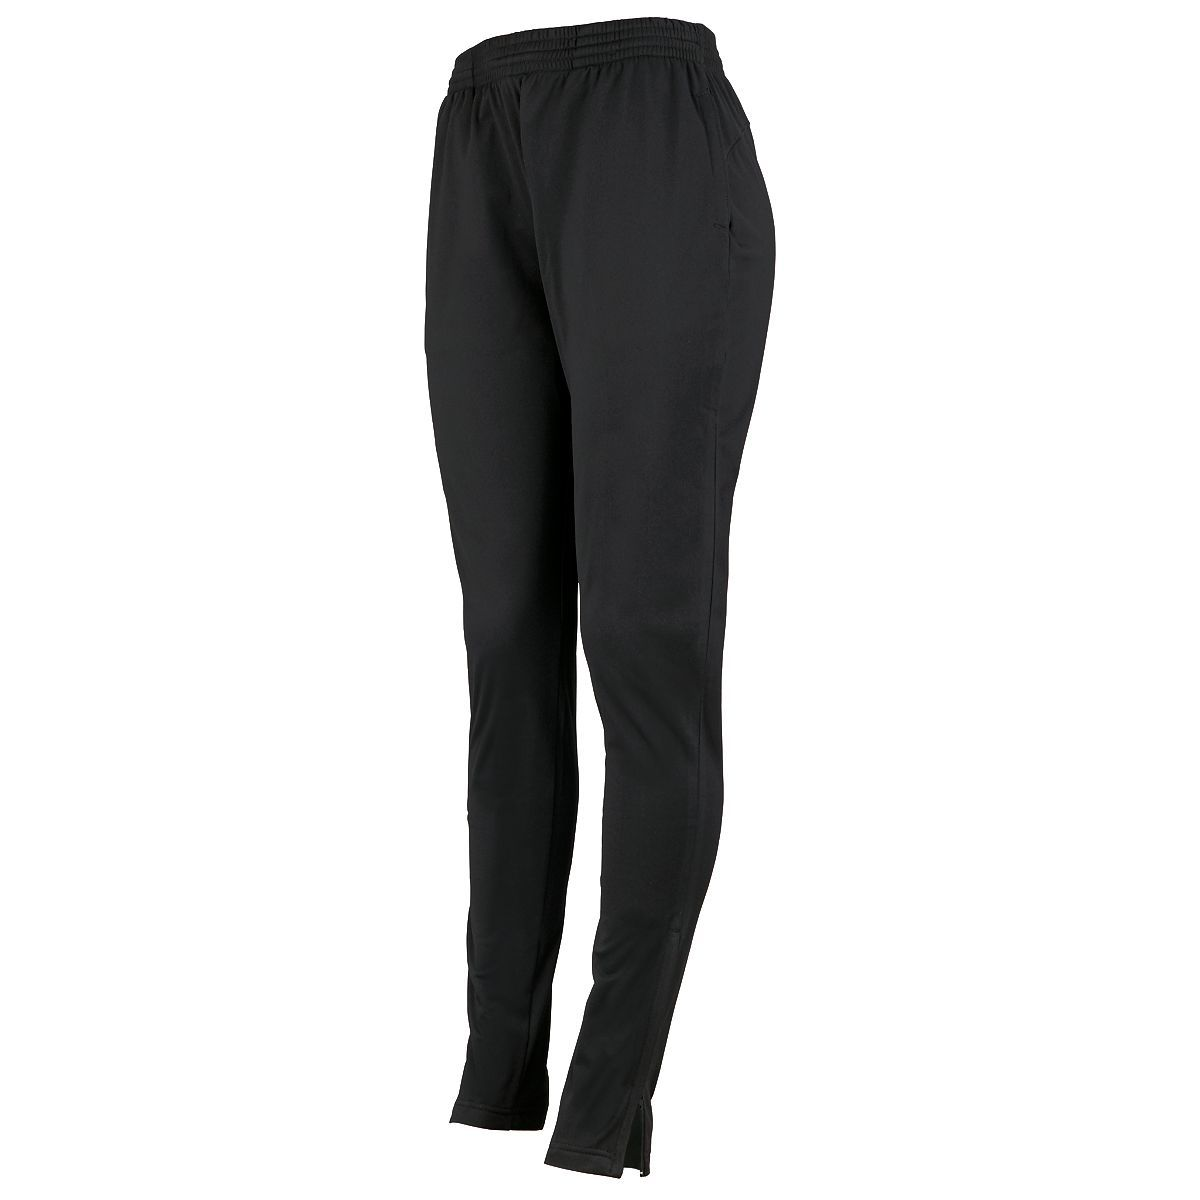 Ladies Tapered Leg Pant - BLACK